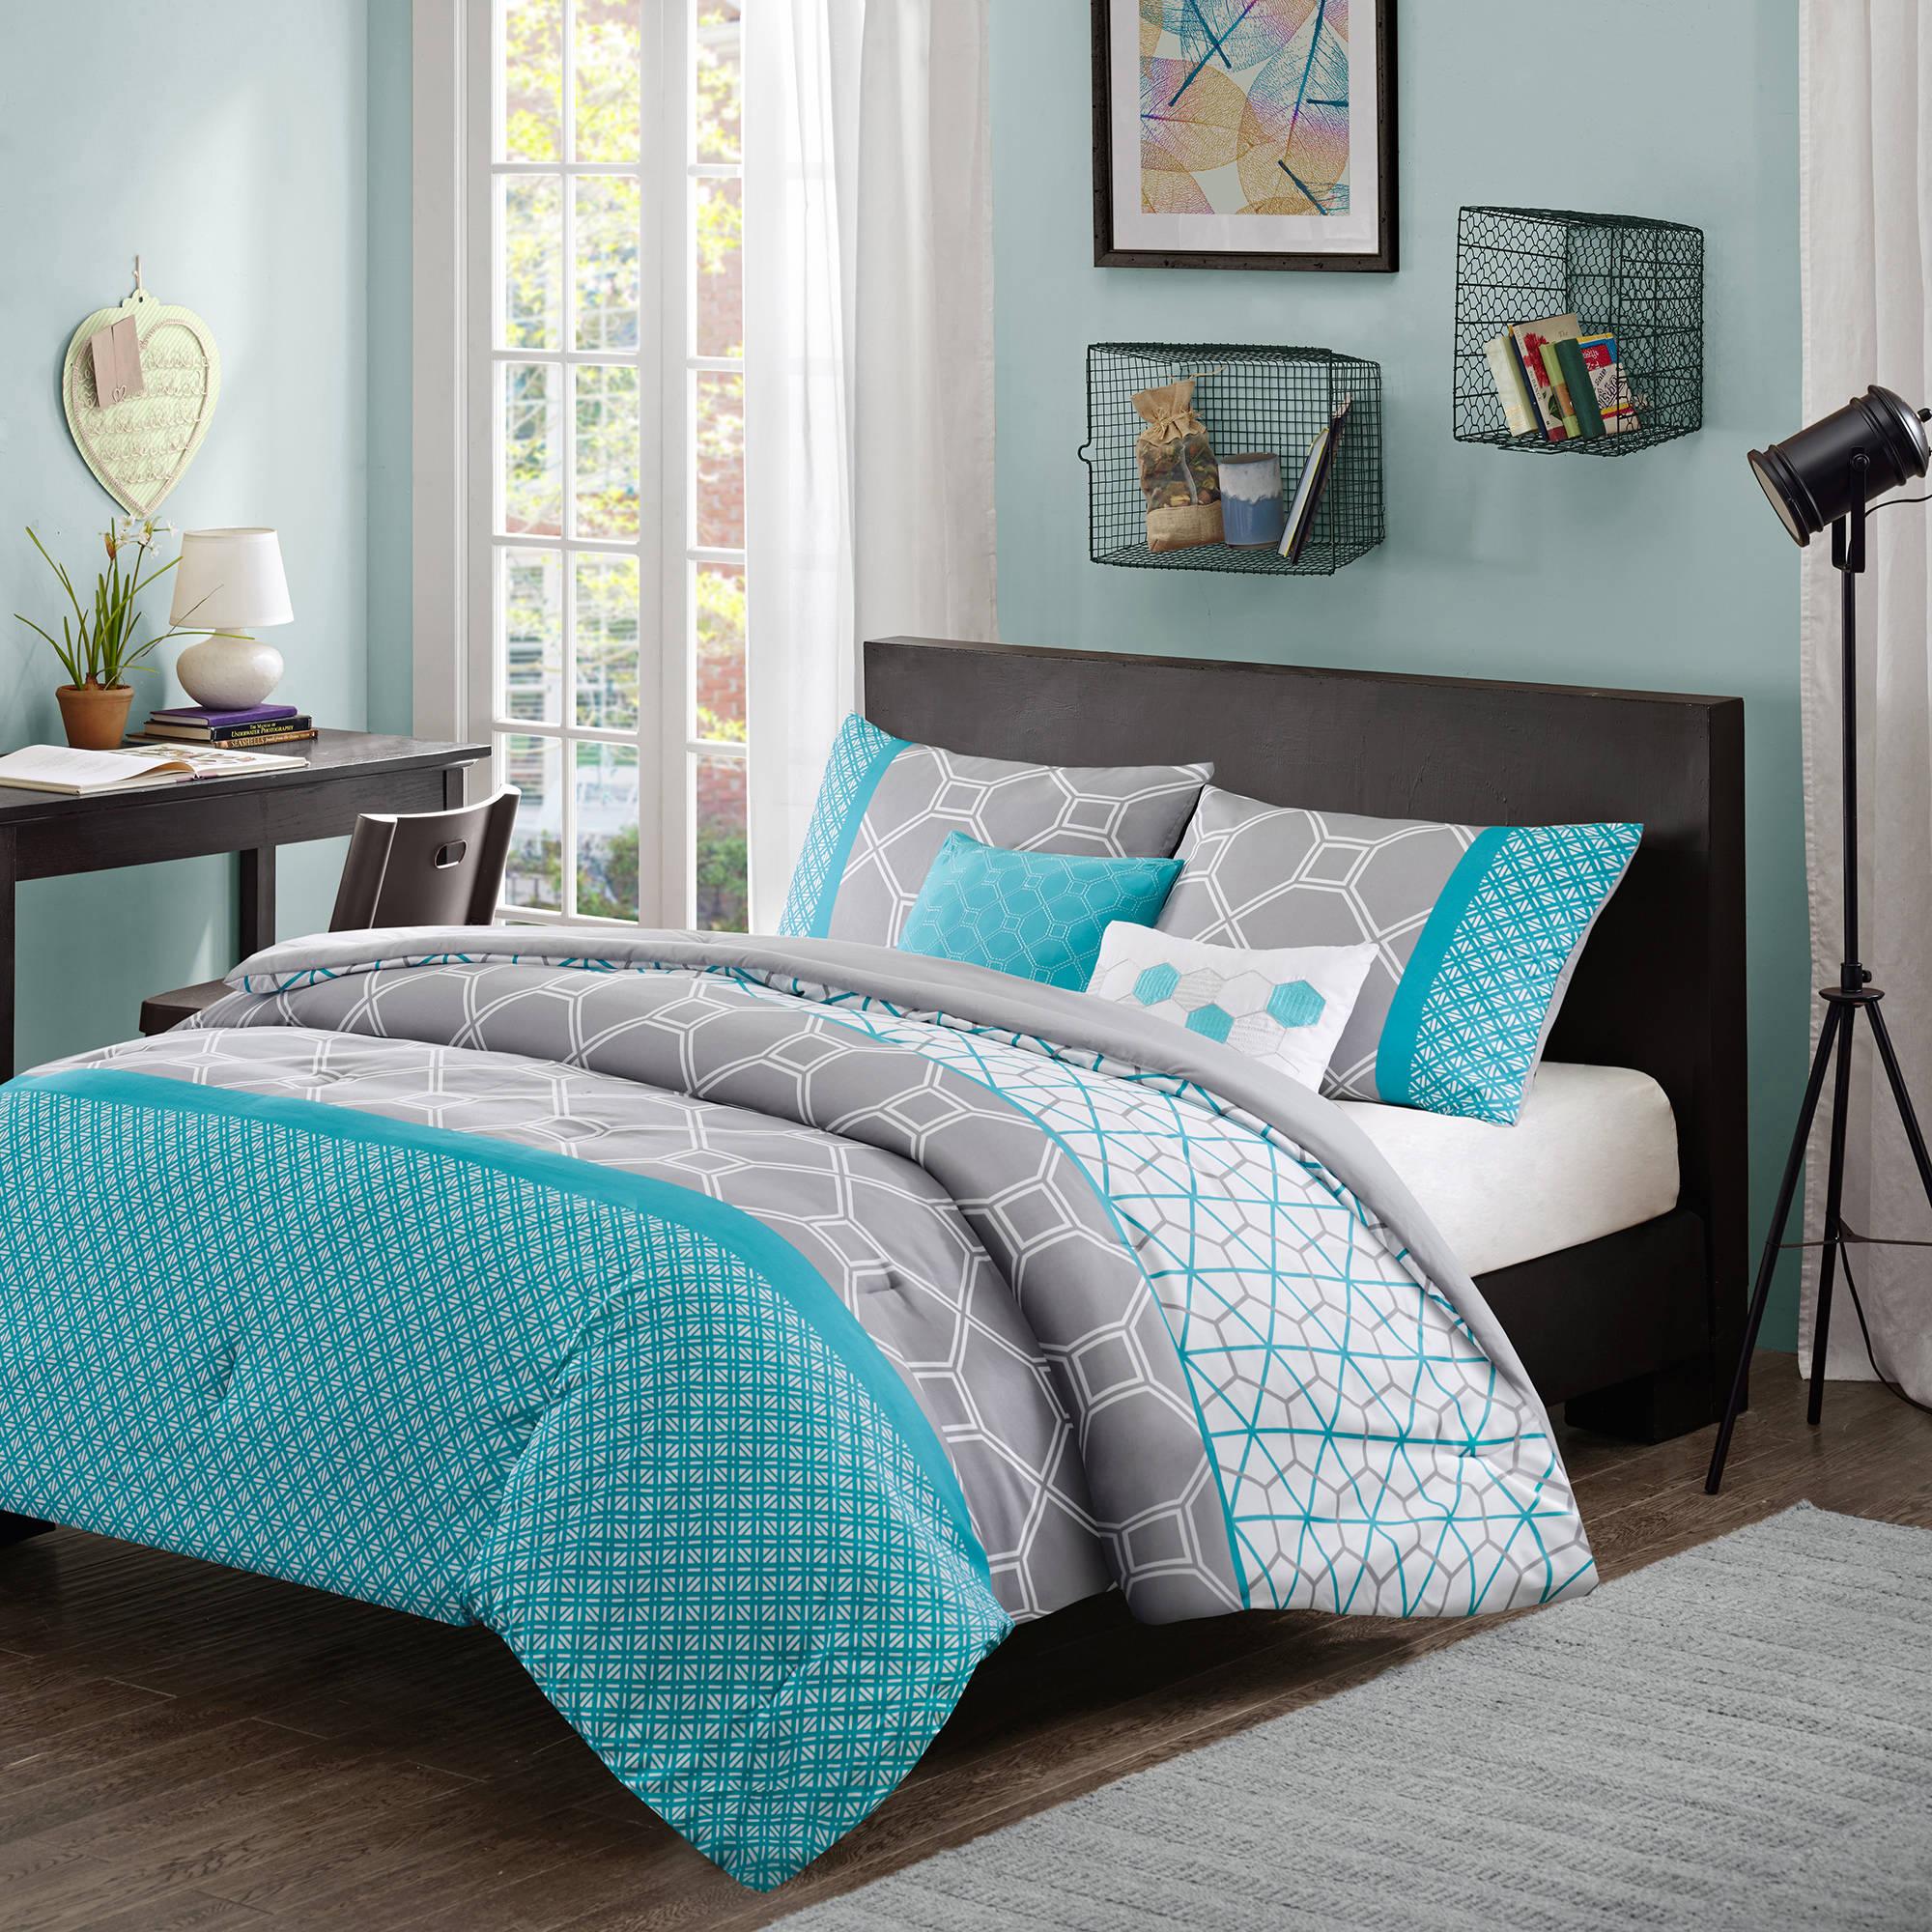 Home Essence Apartment Sarah Bedding Comforter Set